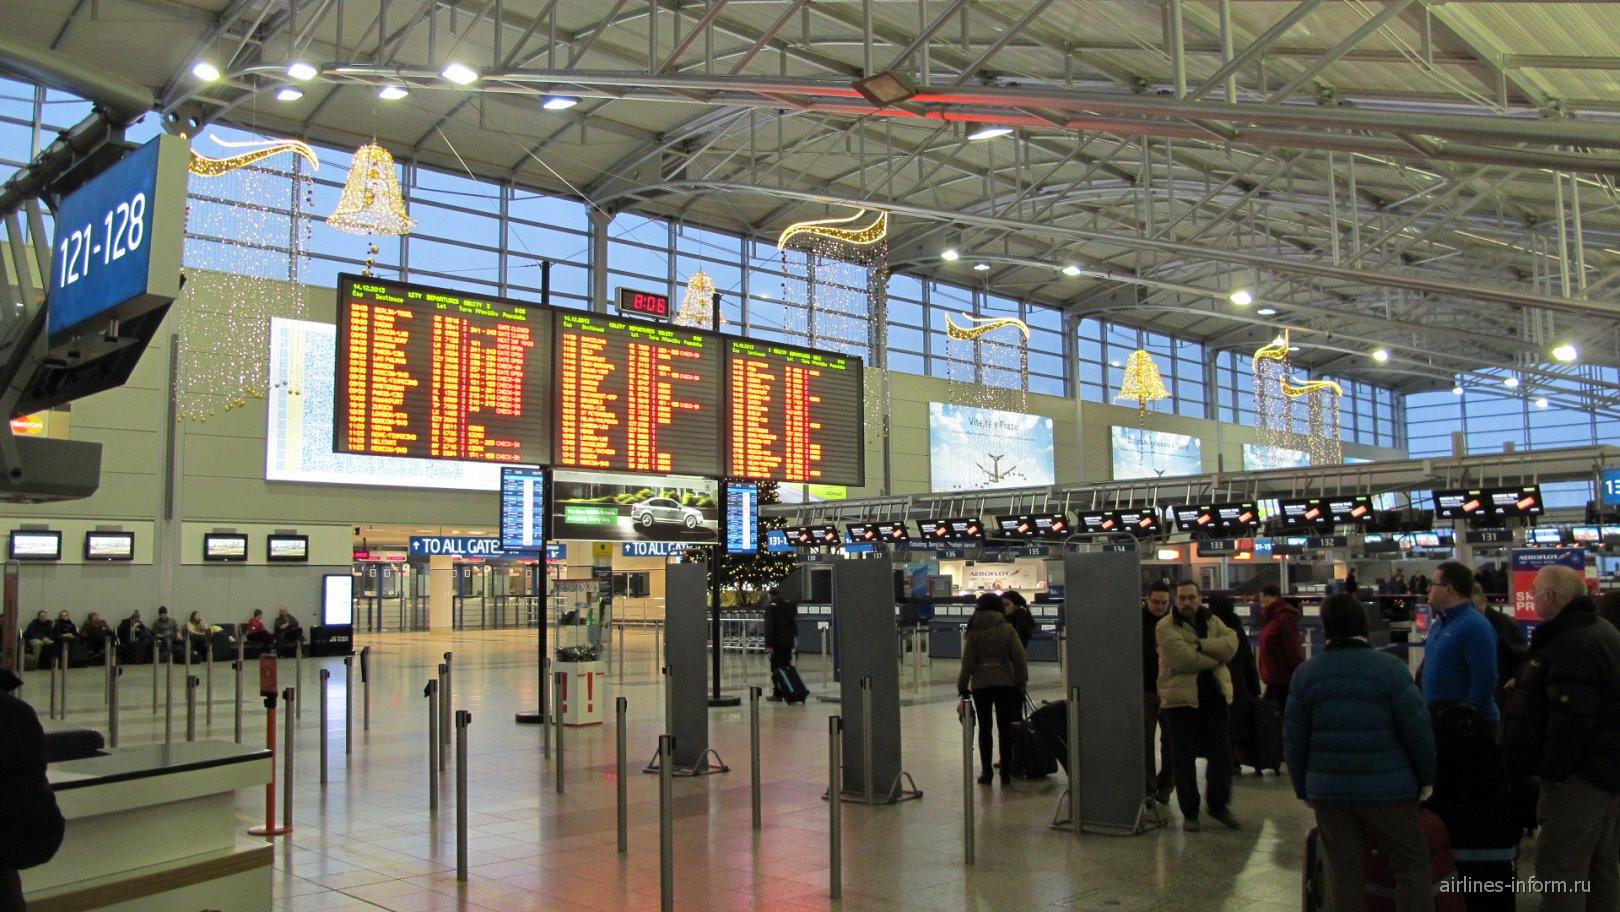 Зона вылета в Терминале 1 аэропорта Прага Вацлав Гавел